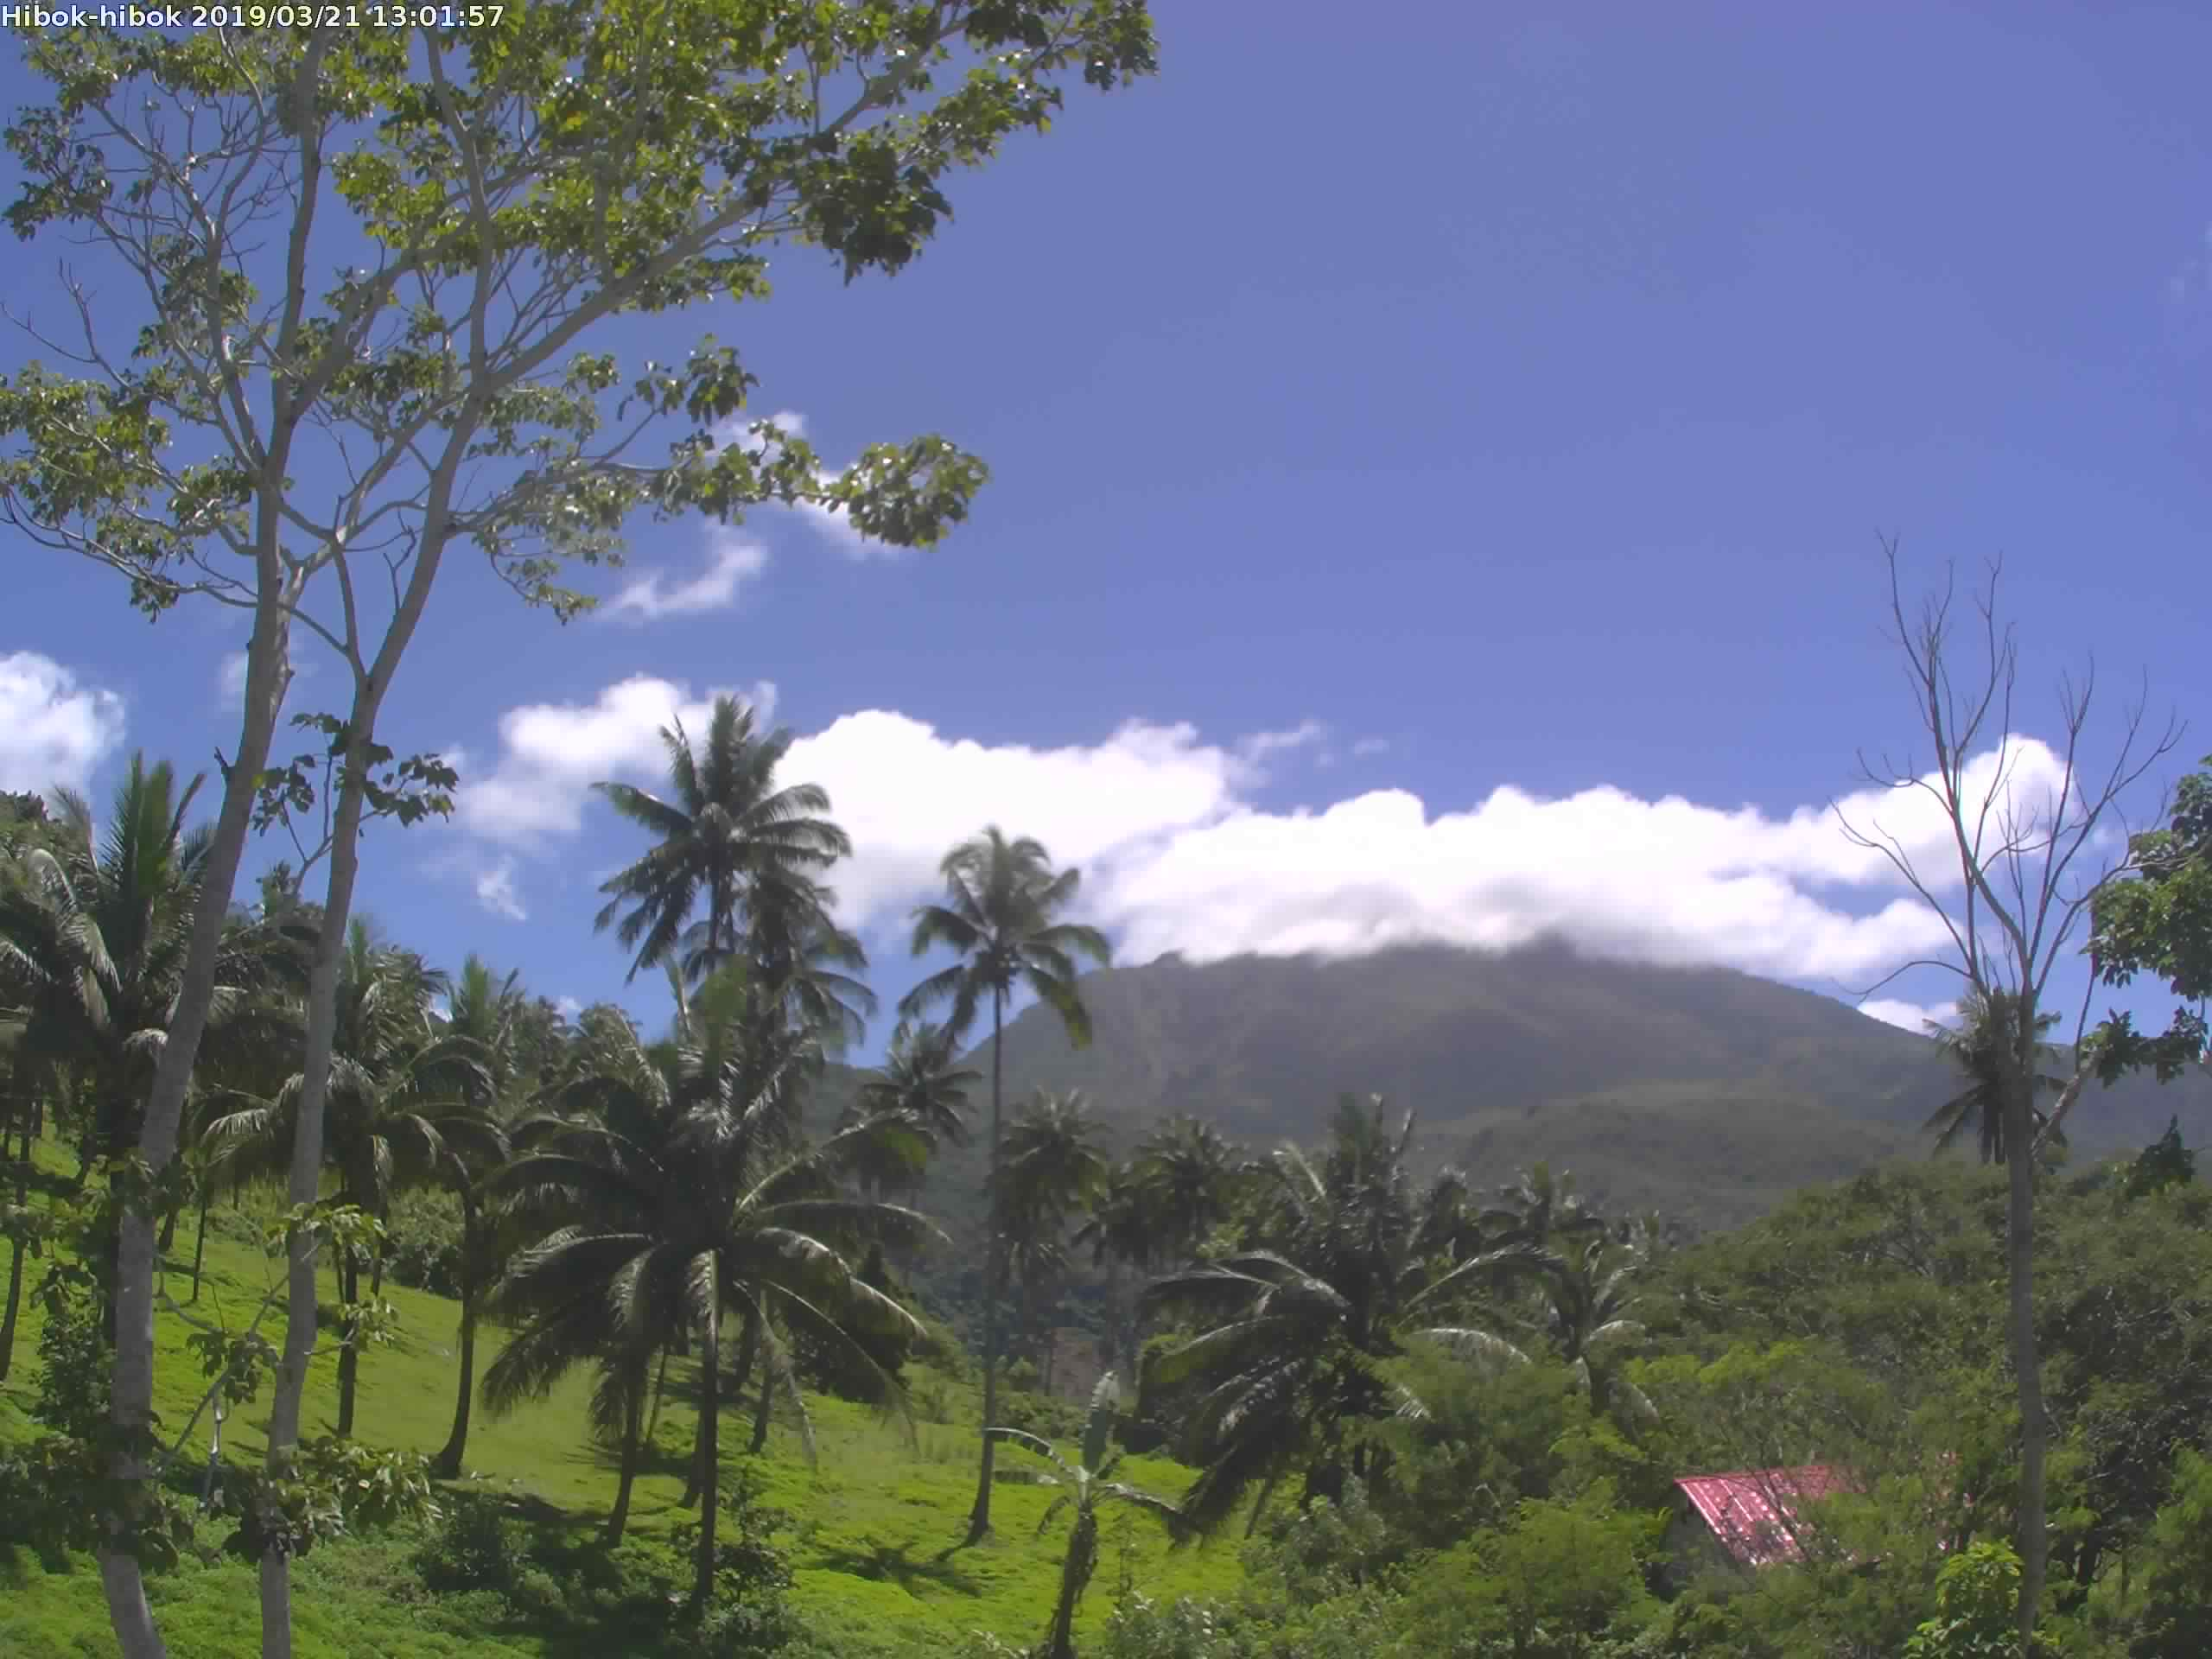 Vulkane Philippinen Karte.Vulkan Hibok Hibok Blick Auf Vulkan Hibok Hibok Webcam Galore